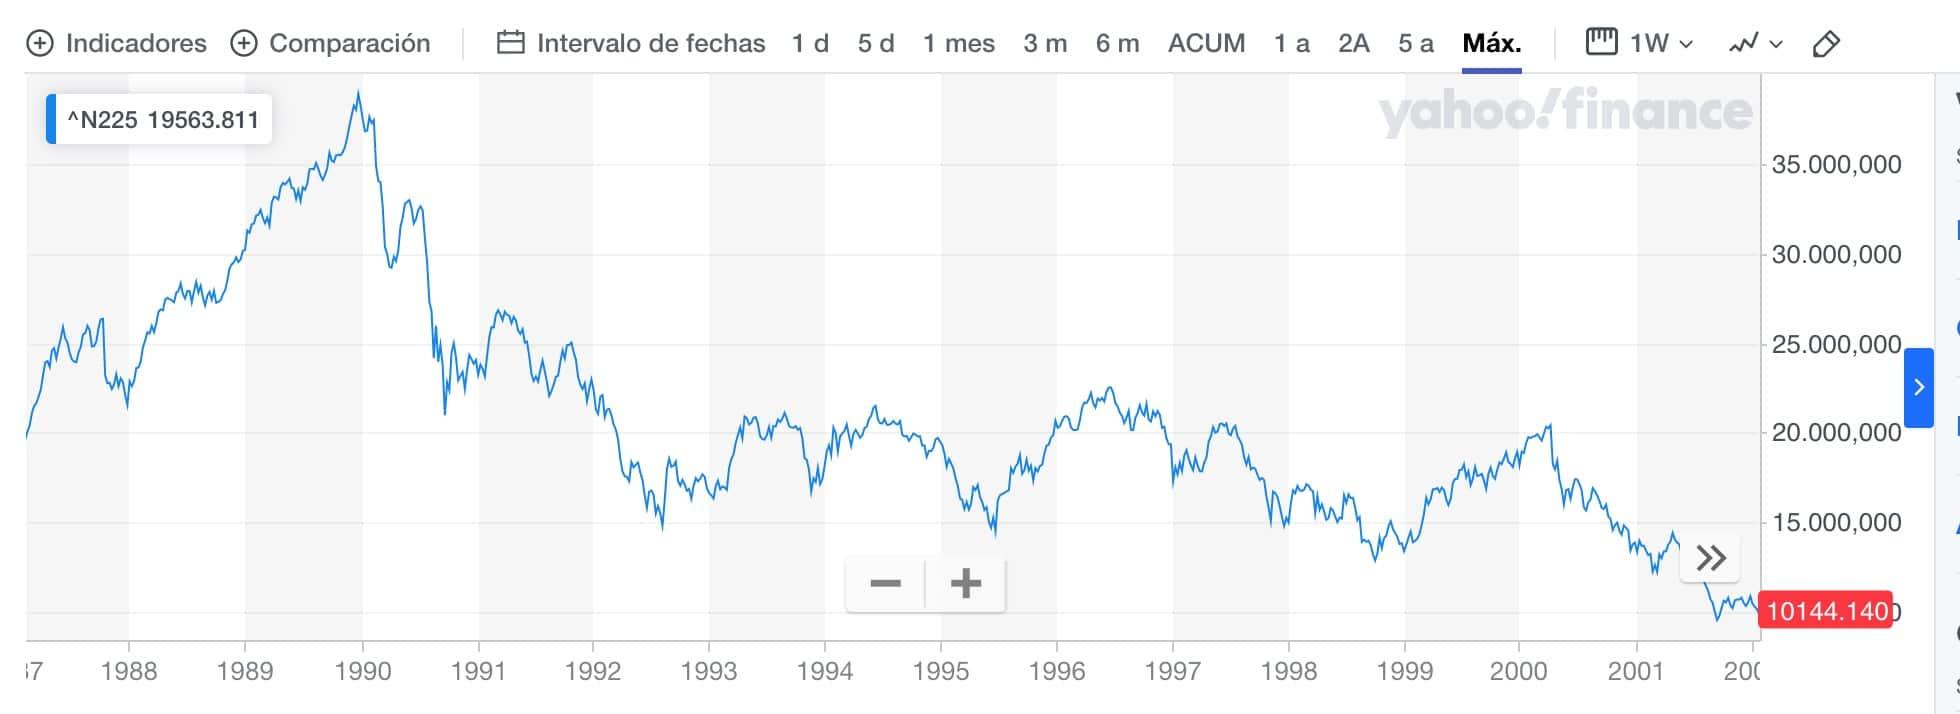 Nikkei grafico histórico